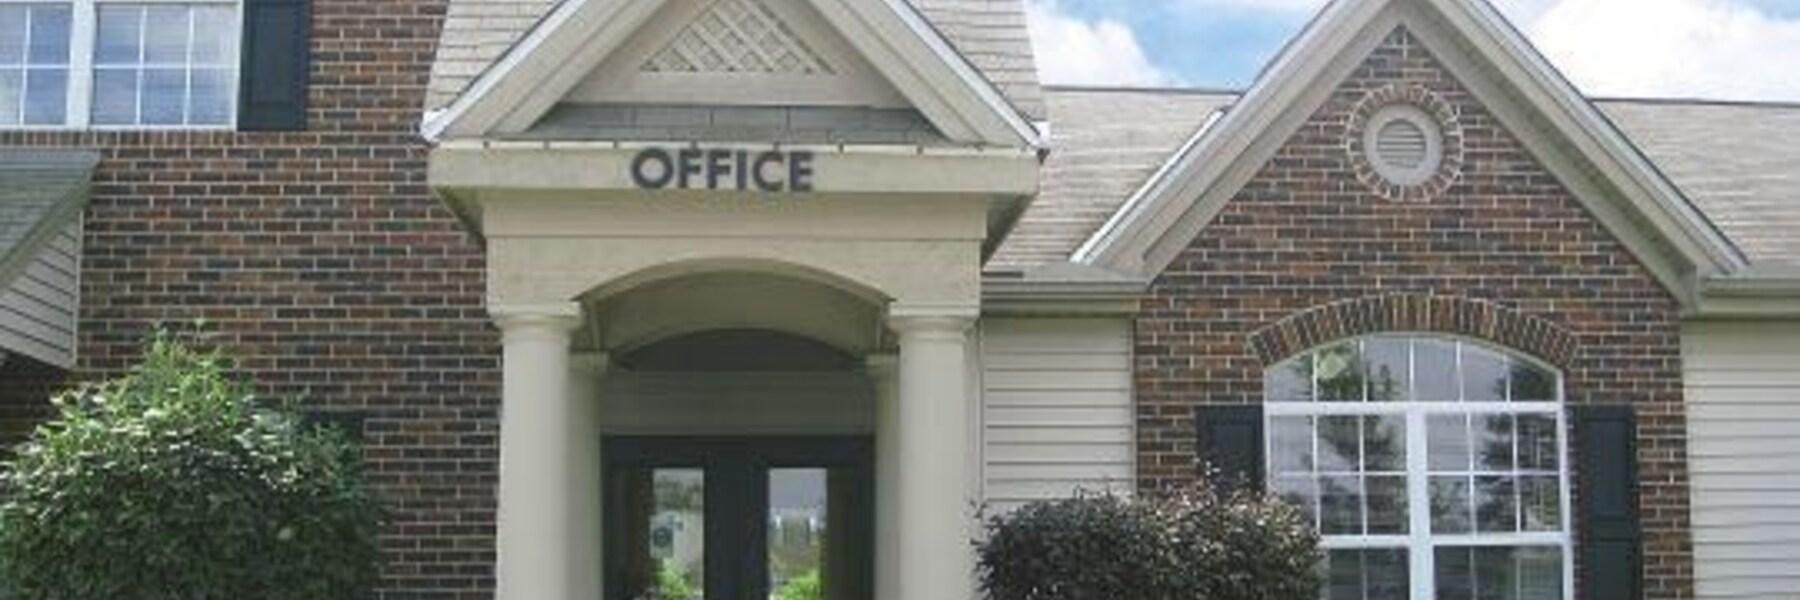 Apartments for Rent in Pickerington, OH | Pickerington Ridge ...